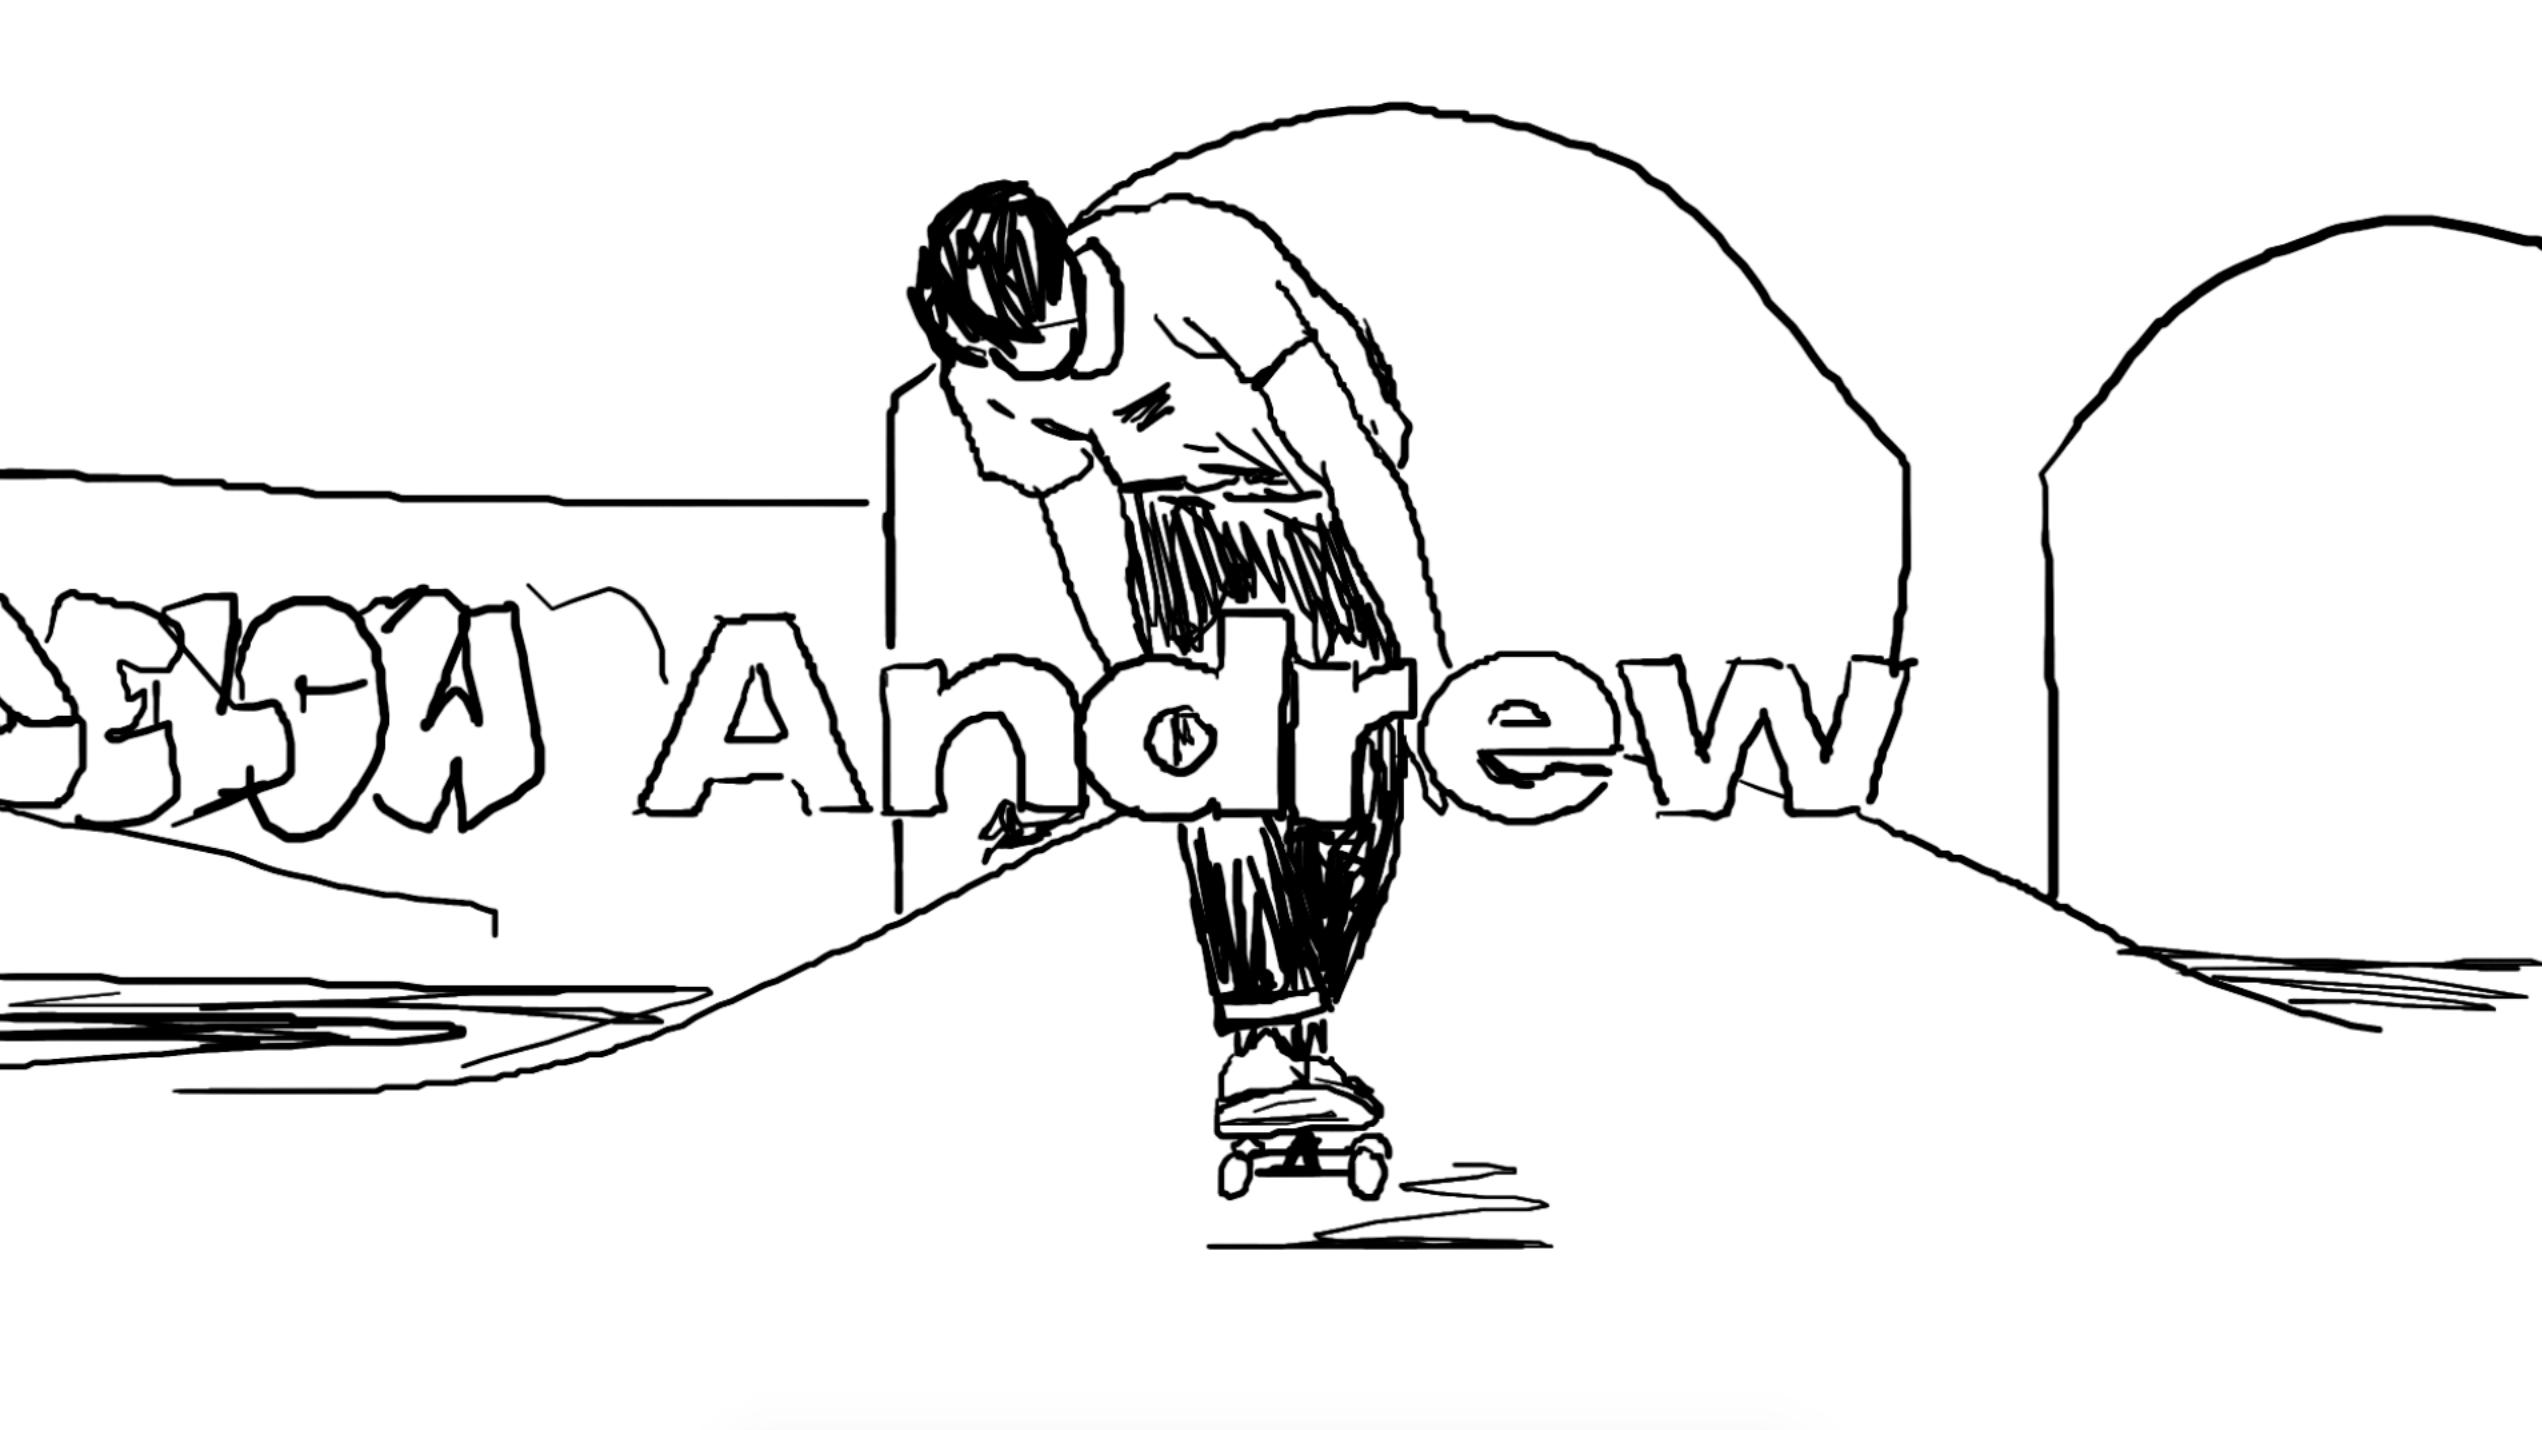 Screenshot of Dylan Reider skating illustration animation, 1/3